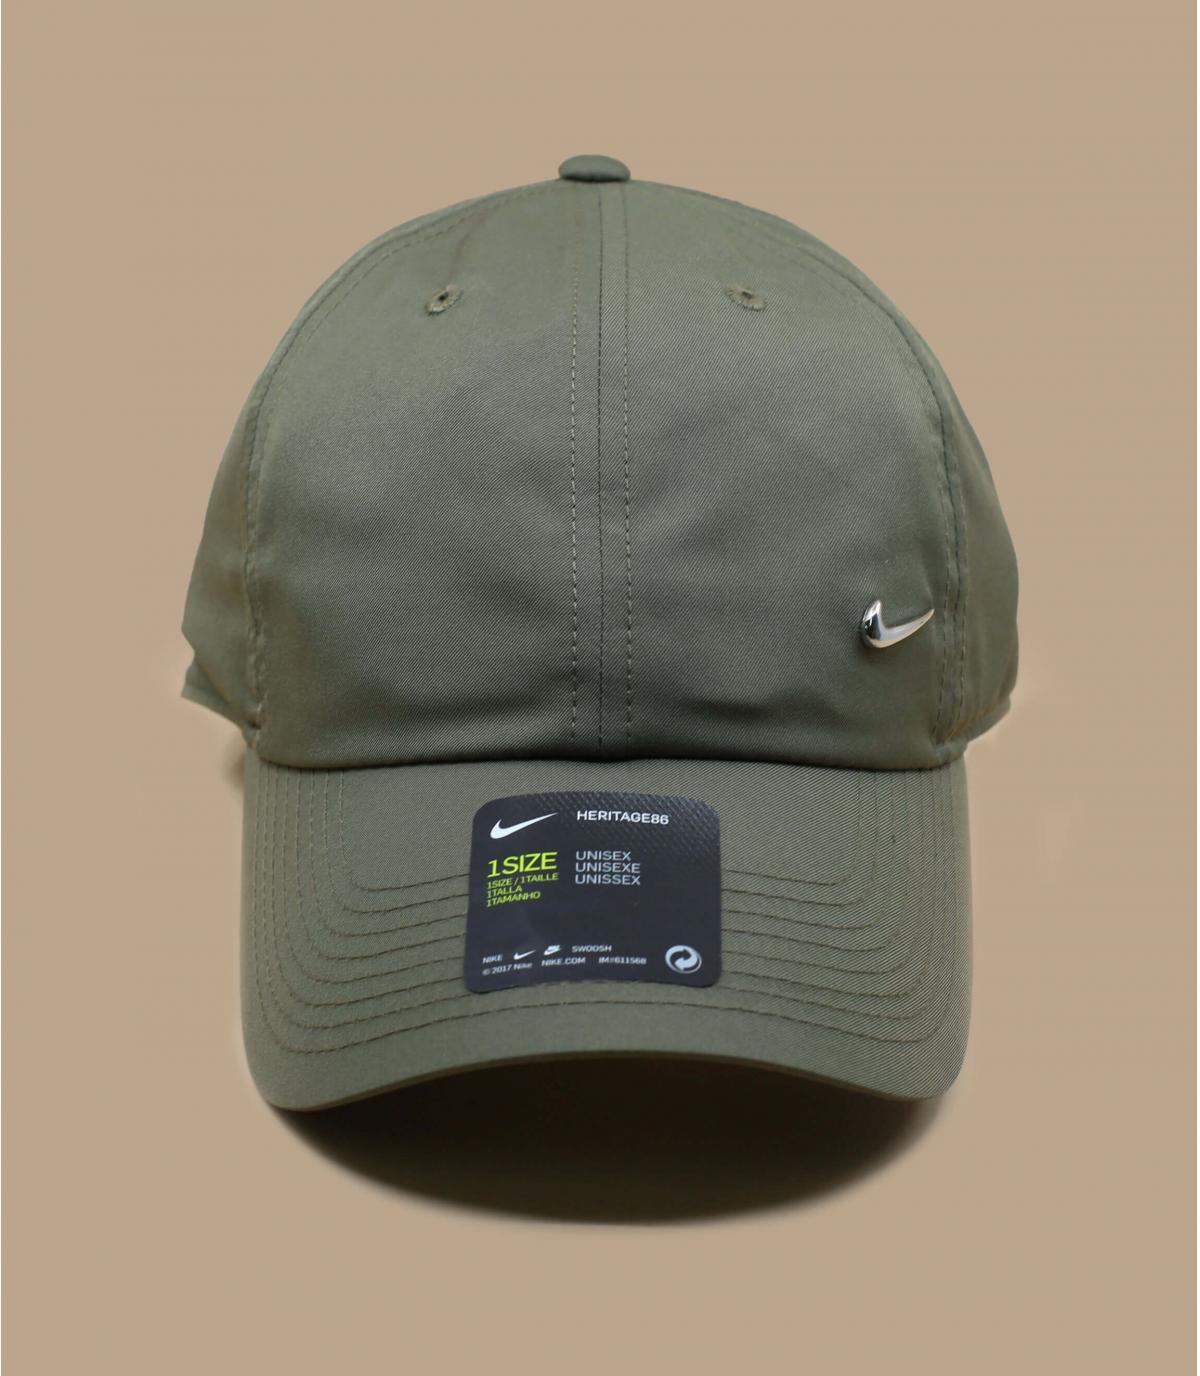 Nike green cap